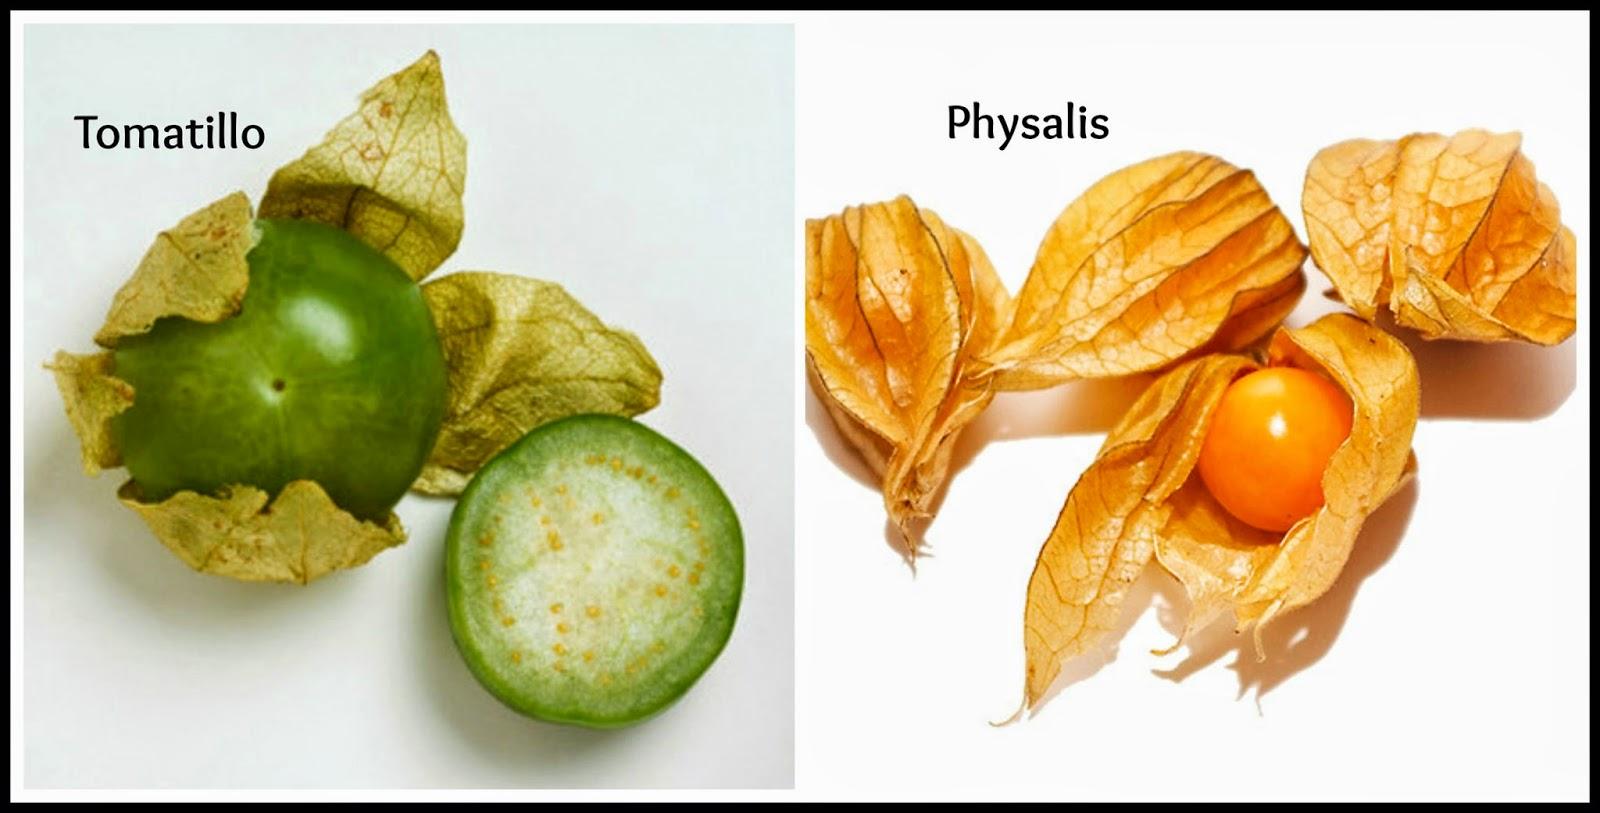 physalis tomatillo